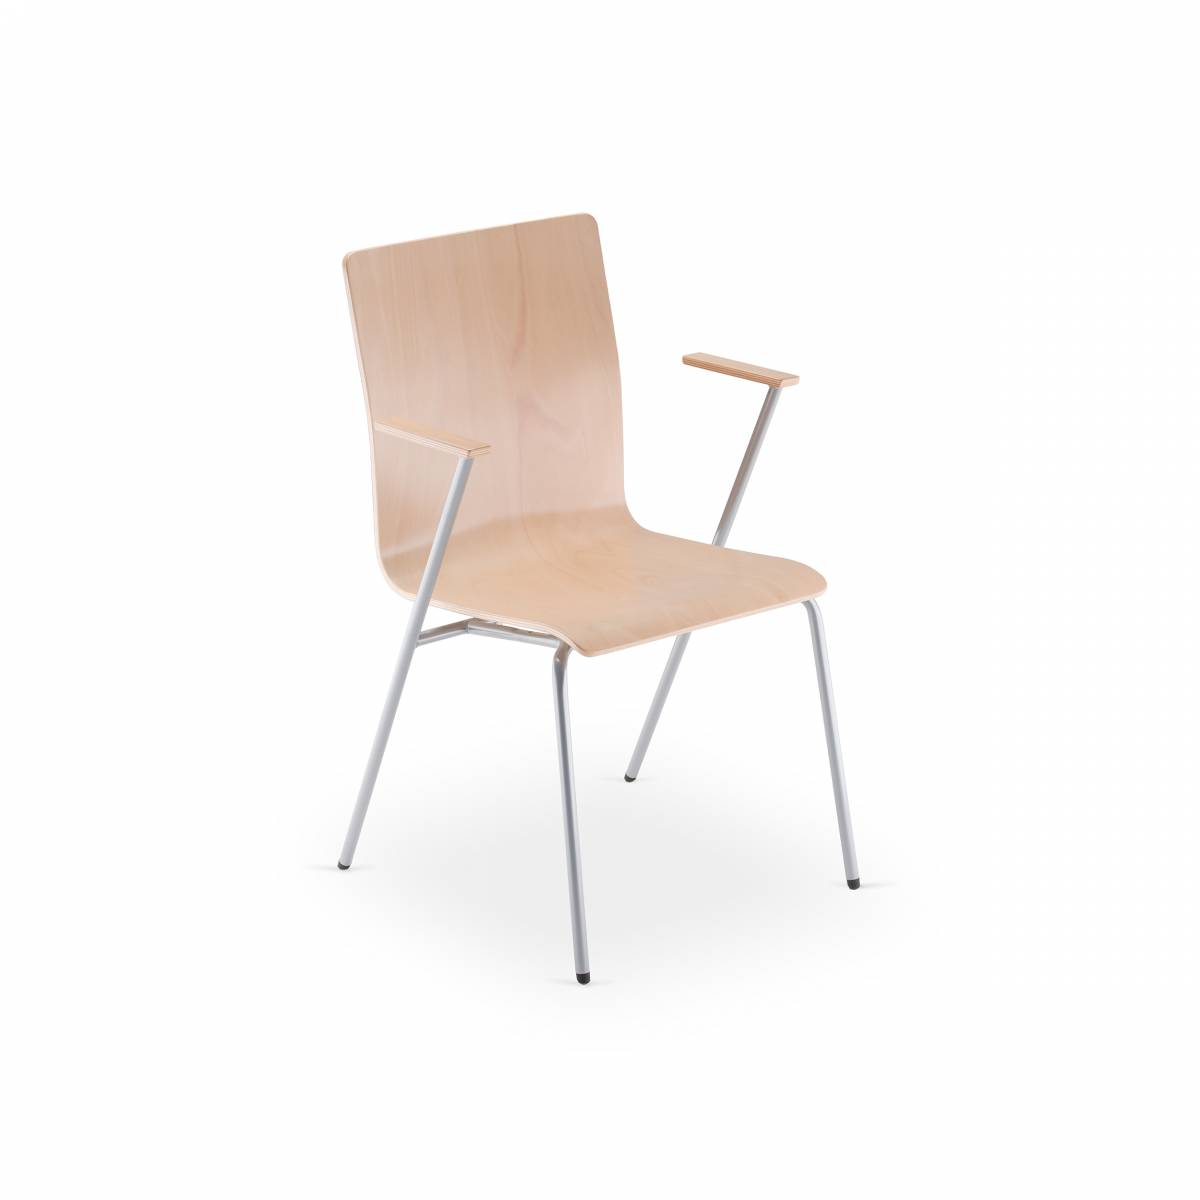 chaise FEN coque bois accoudoir sur Gemenos